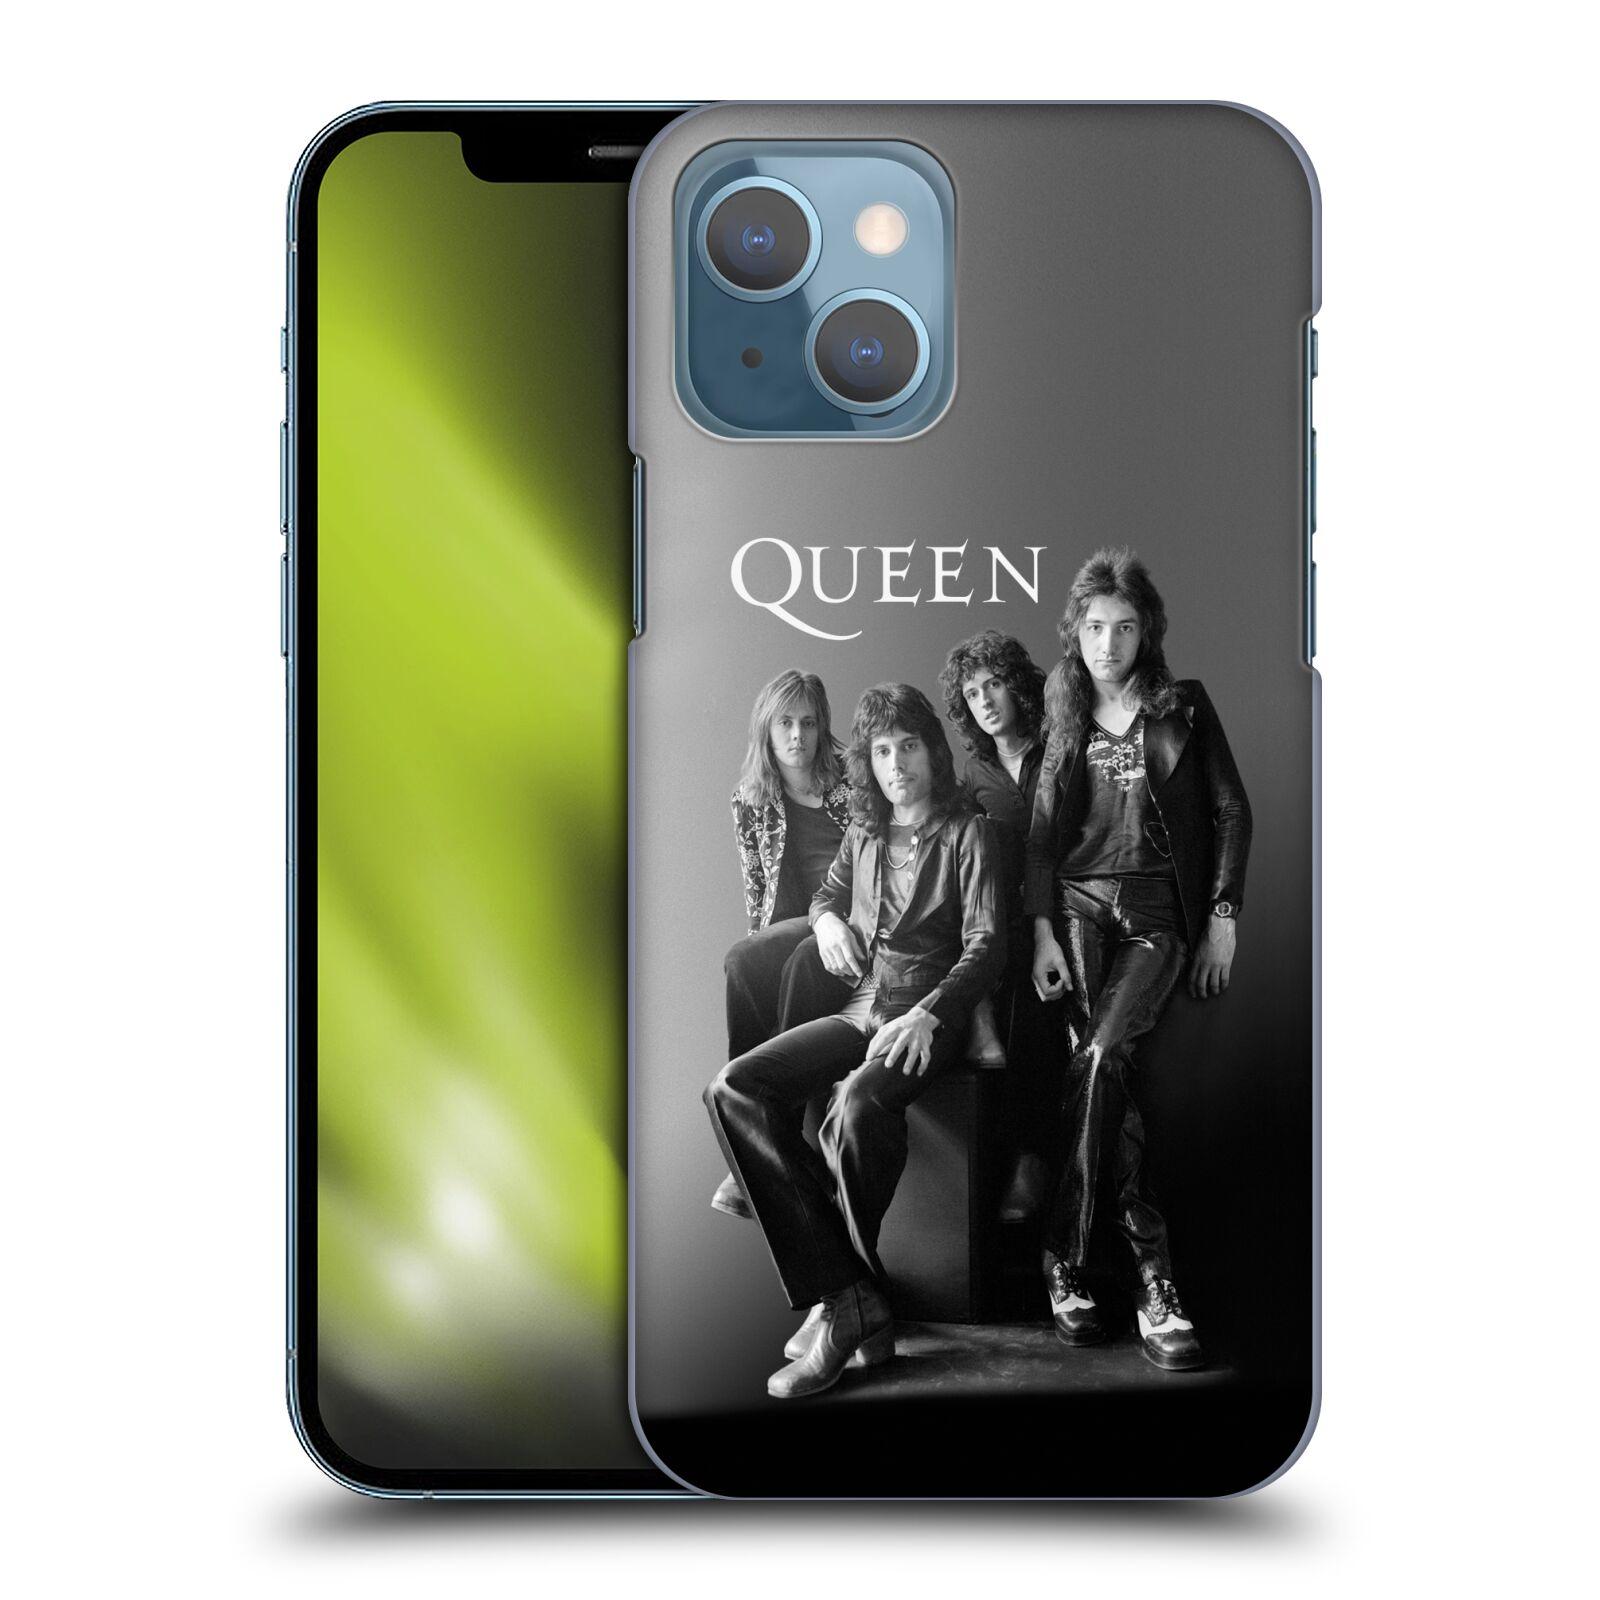 Plastové pouzdro na mobil Apple iPhone 13 - Head Case - Queen - Skupina